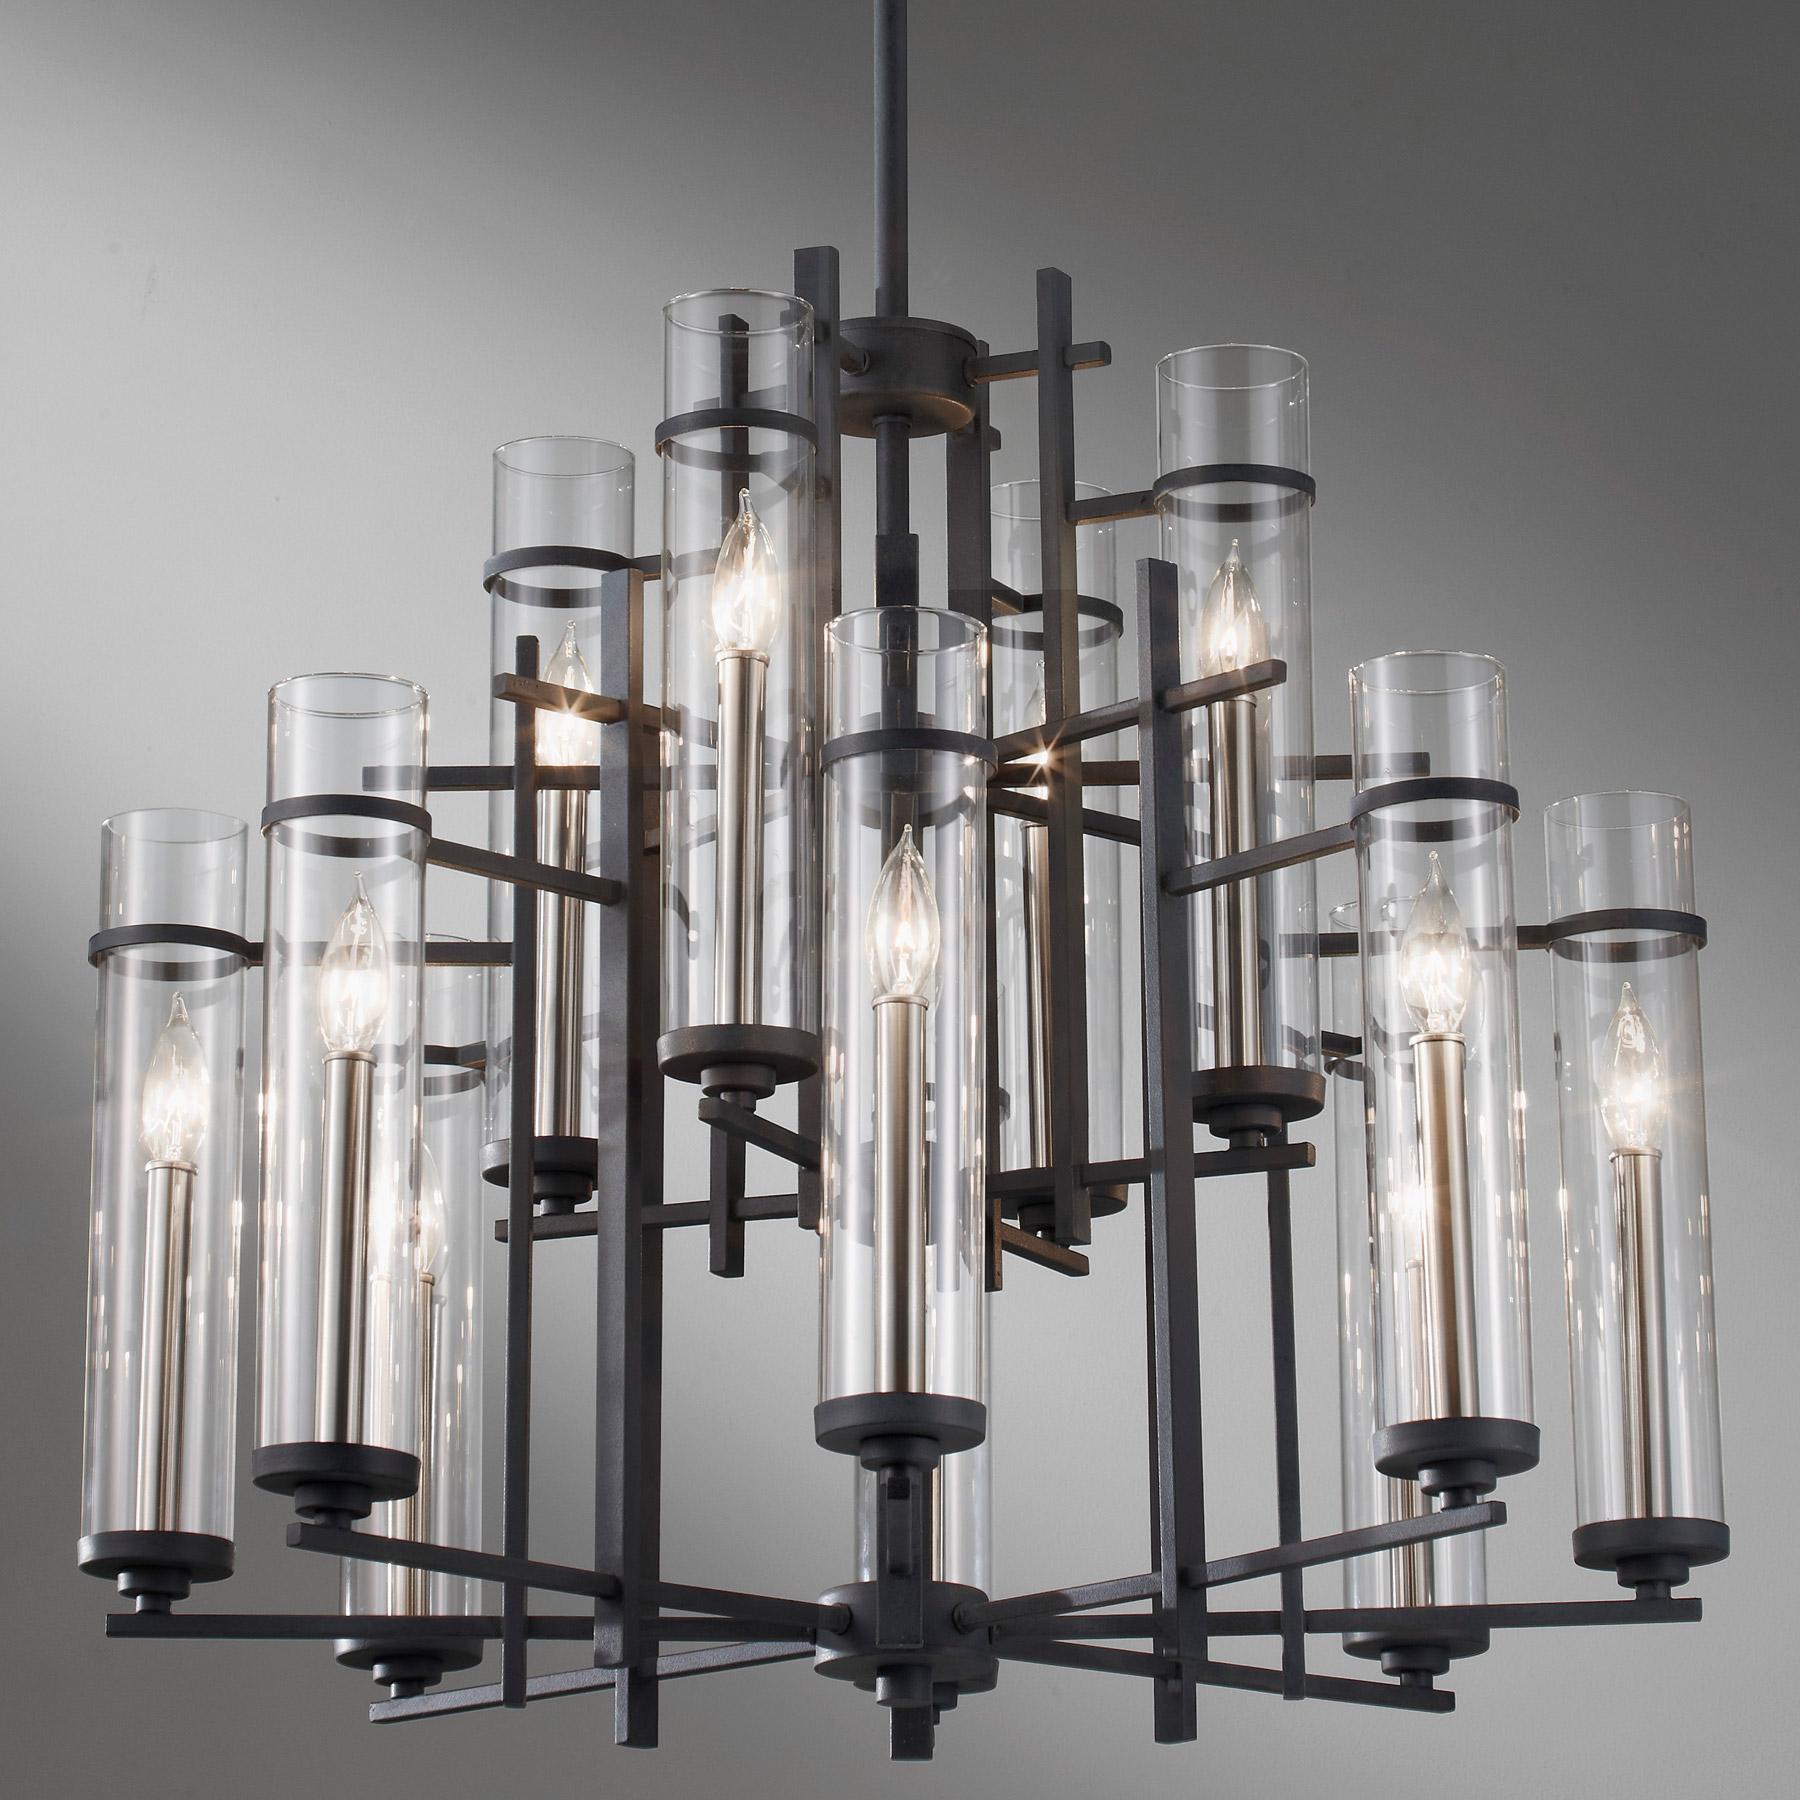 Feiss f262984afbs ethan twelve light chandelier aloadofball Choice Image